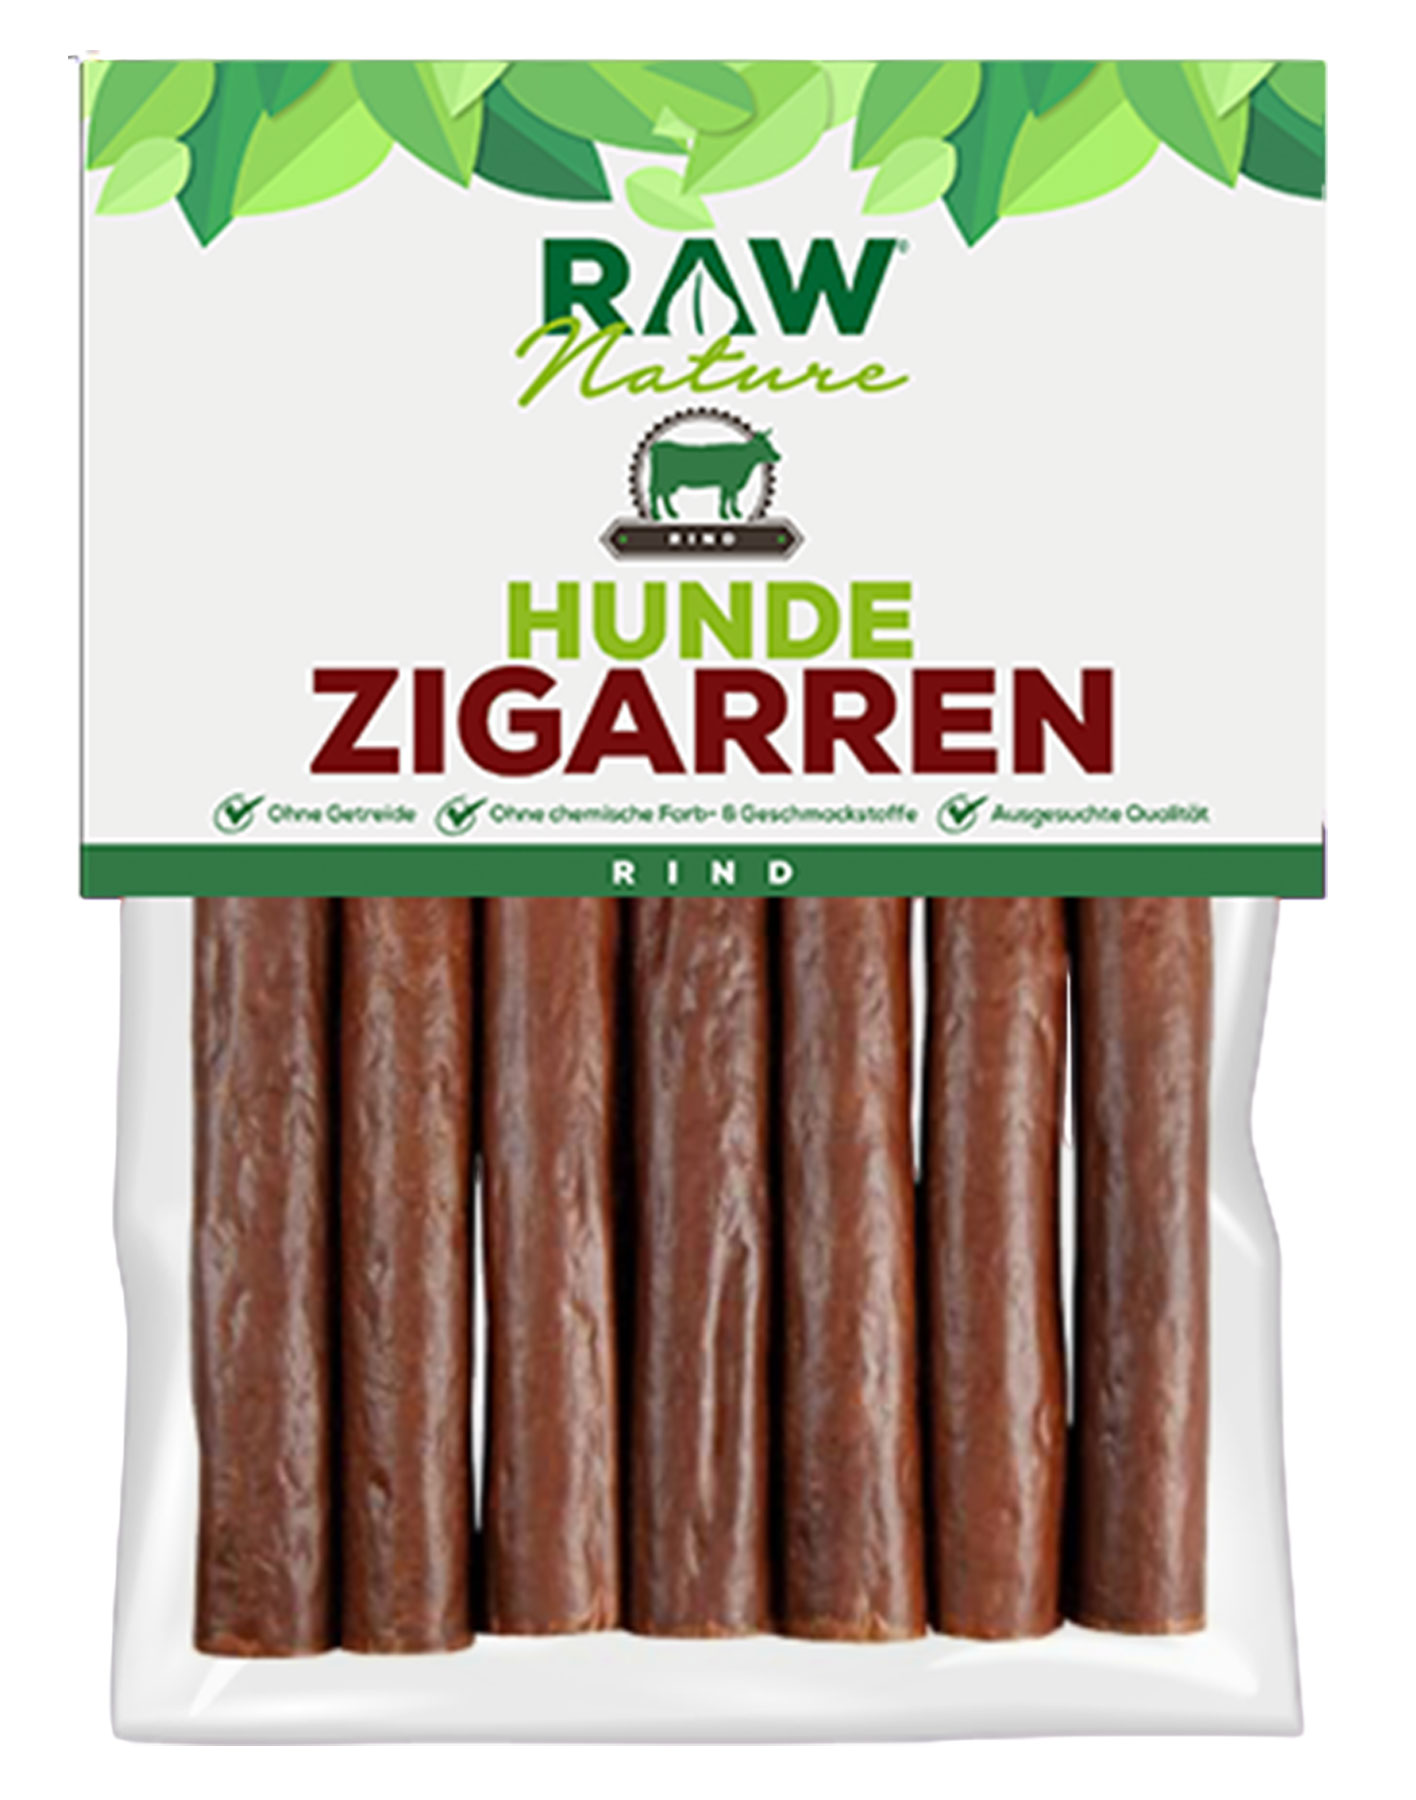 RawNature_Hunde_Zigarren_Rind